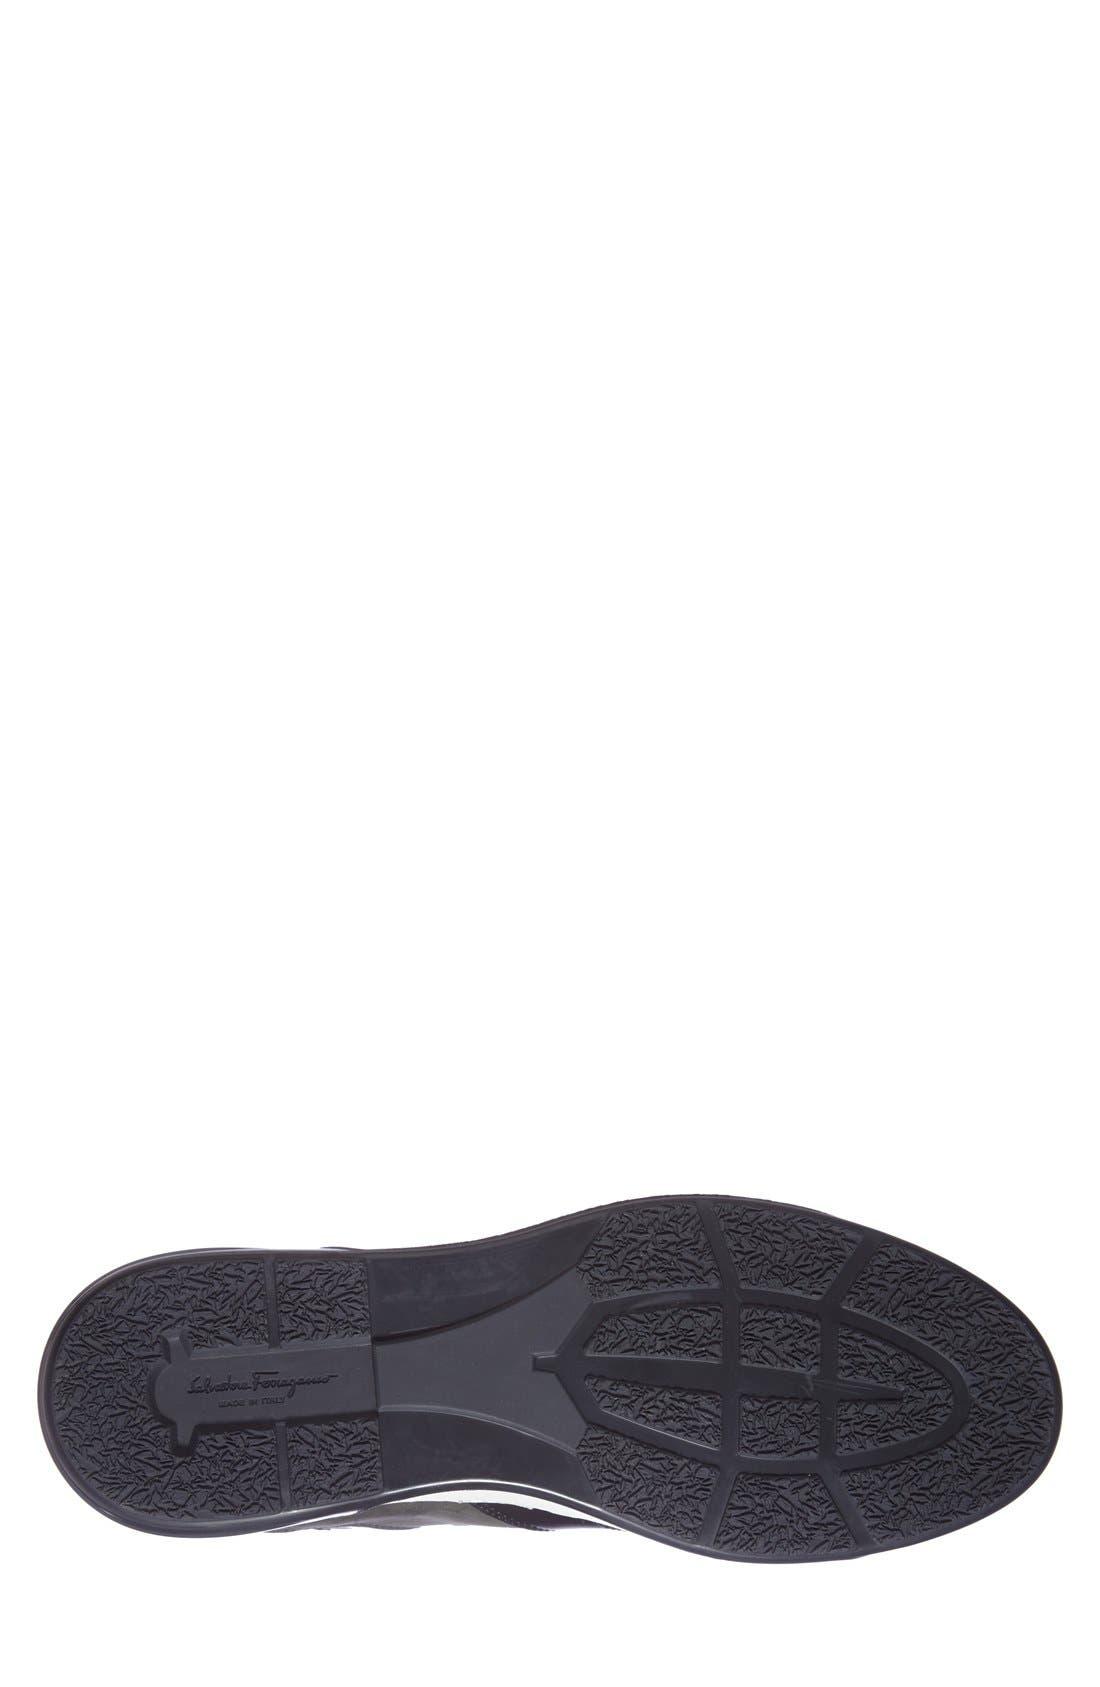 'Monroe' Sneaker,                             Alternate thumbnail 2, color,                             004